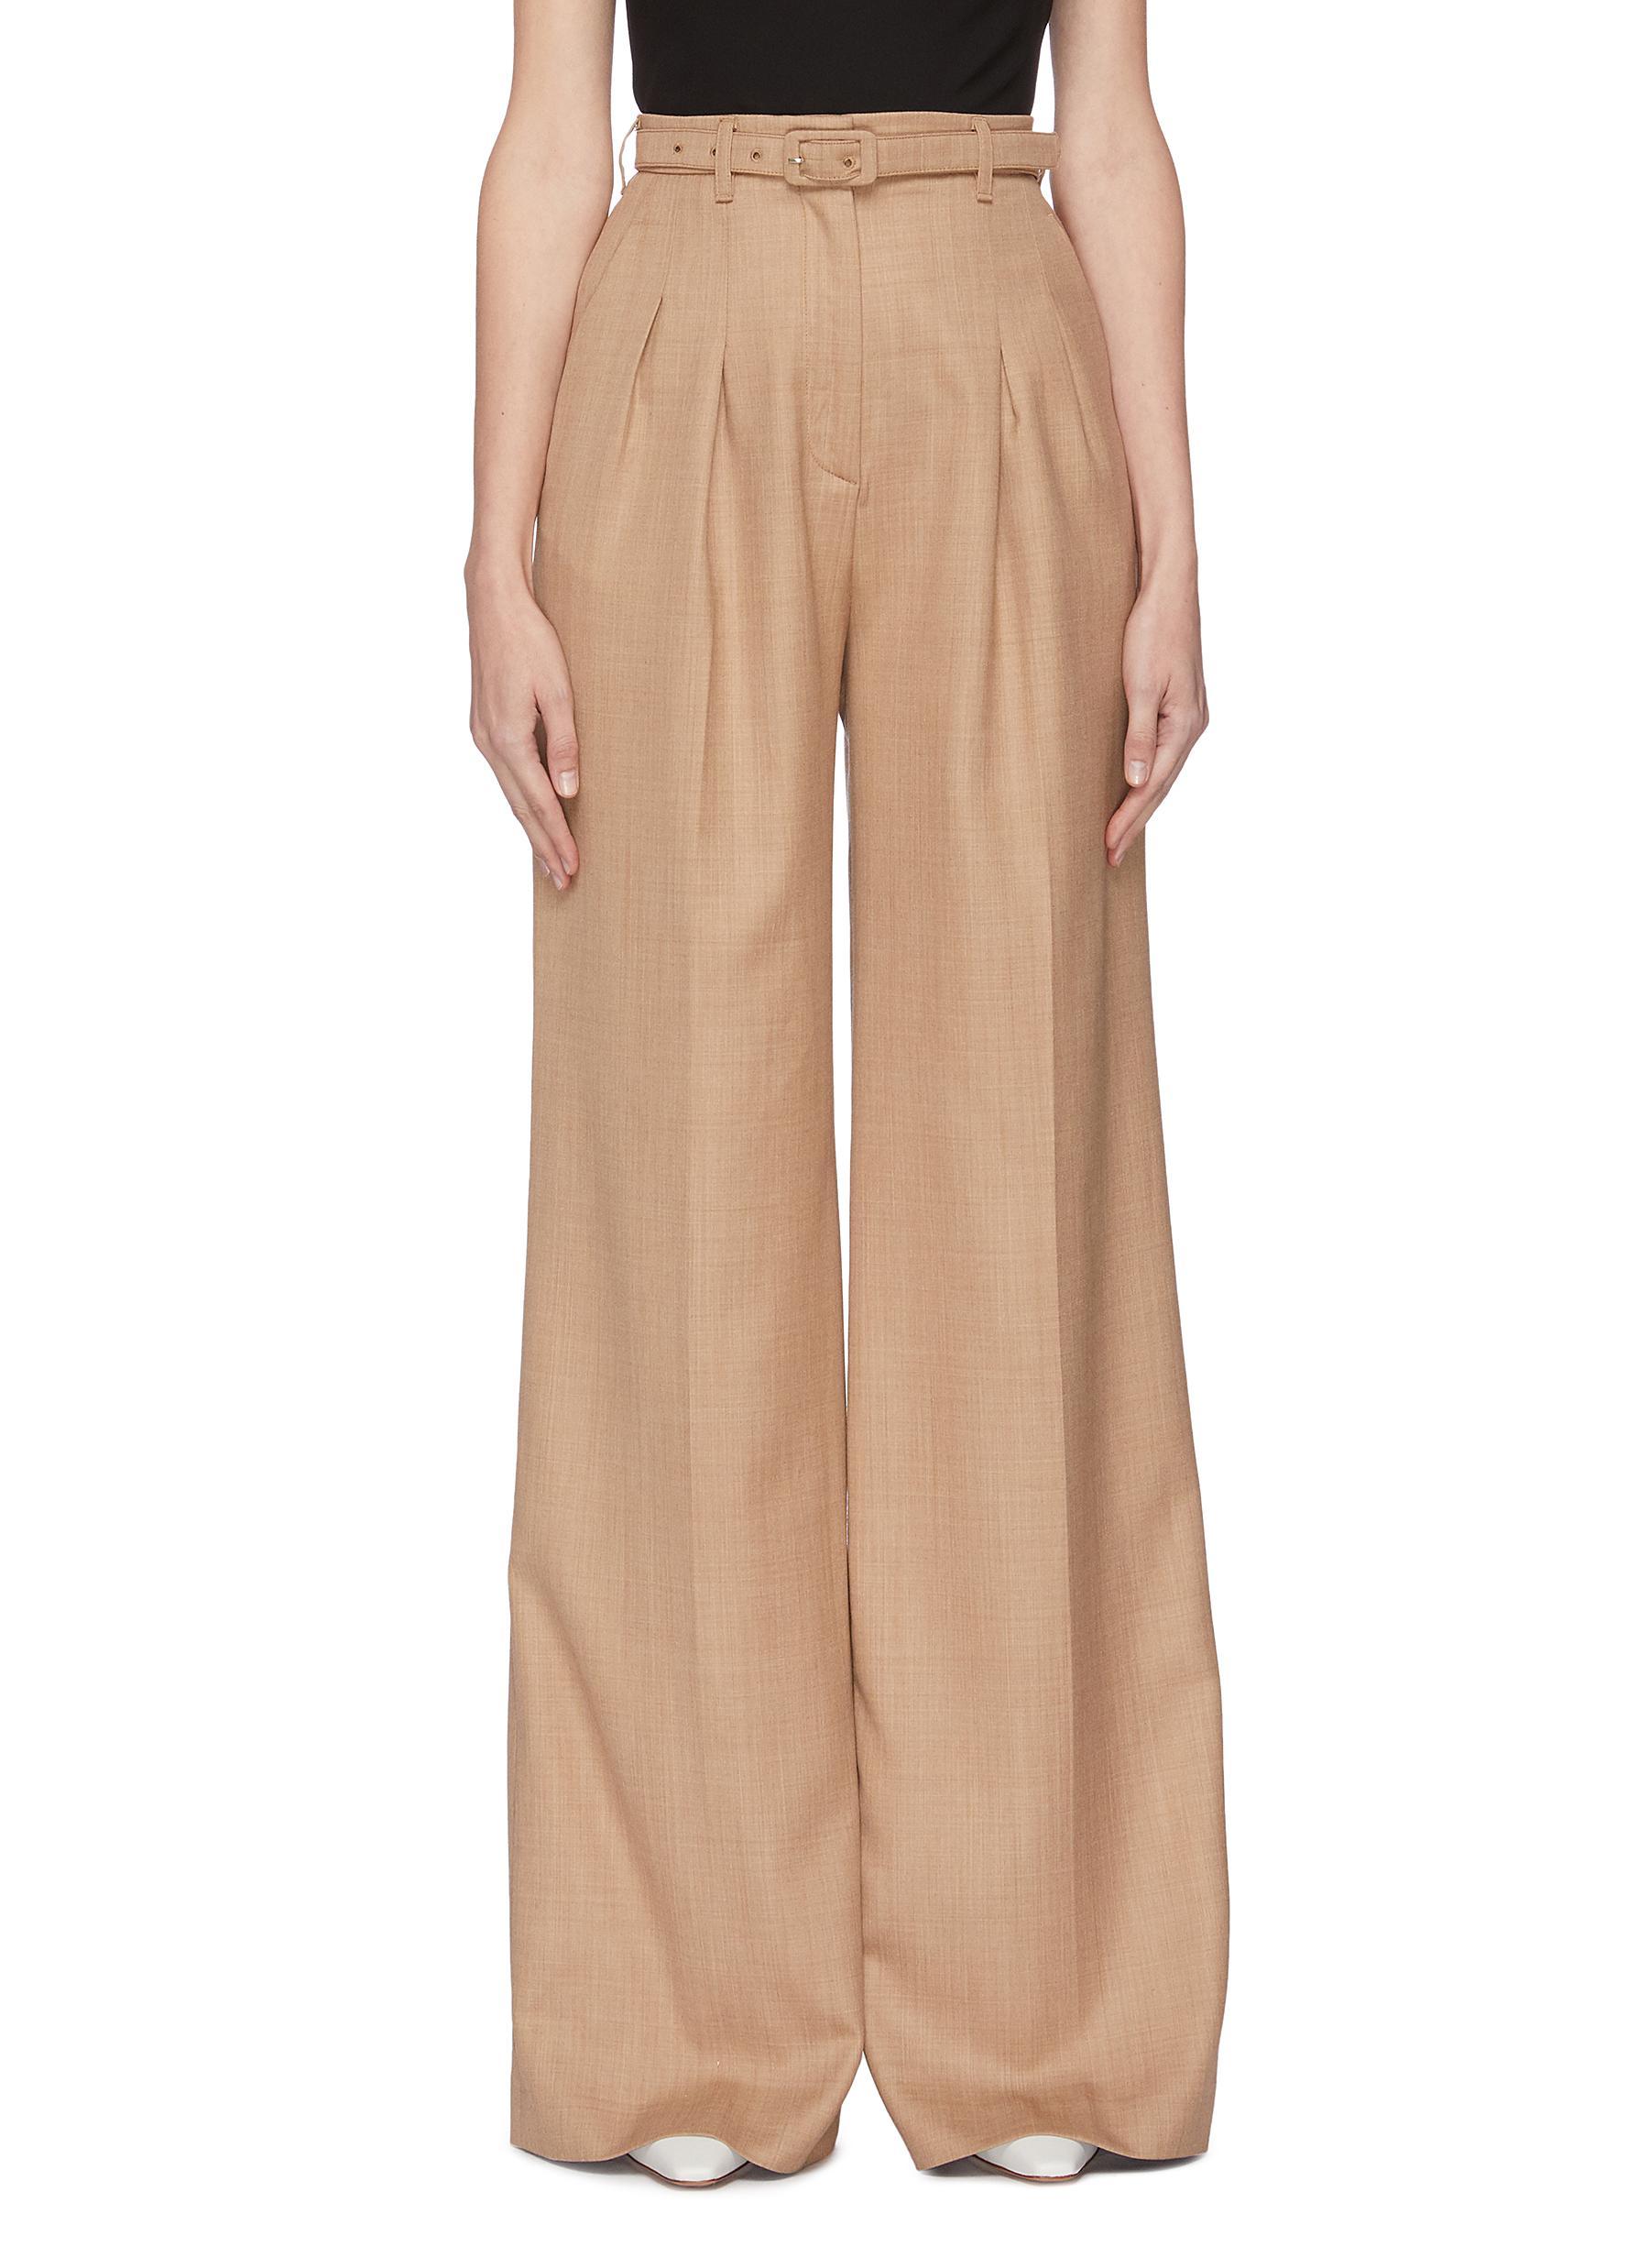 Buy Gabriela Hearst Pants & Shorts 'Vargas' belted wide leg pants